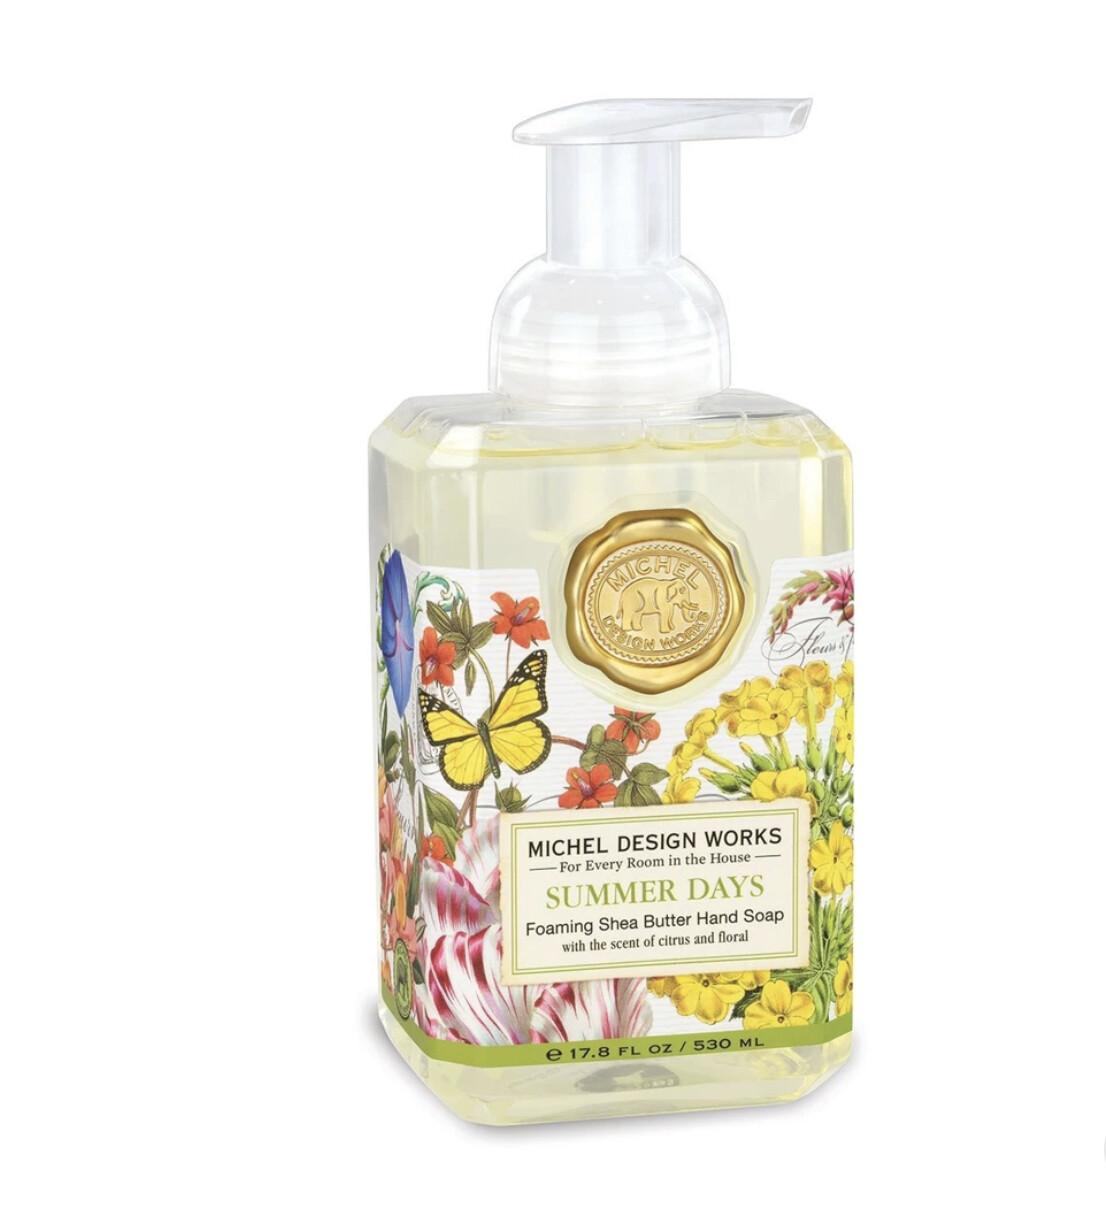 MICHEL DESIGN WORKS - Summer Days Foaming Soap